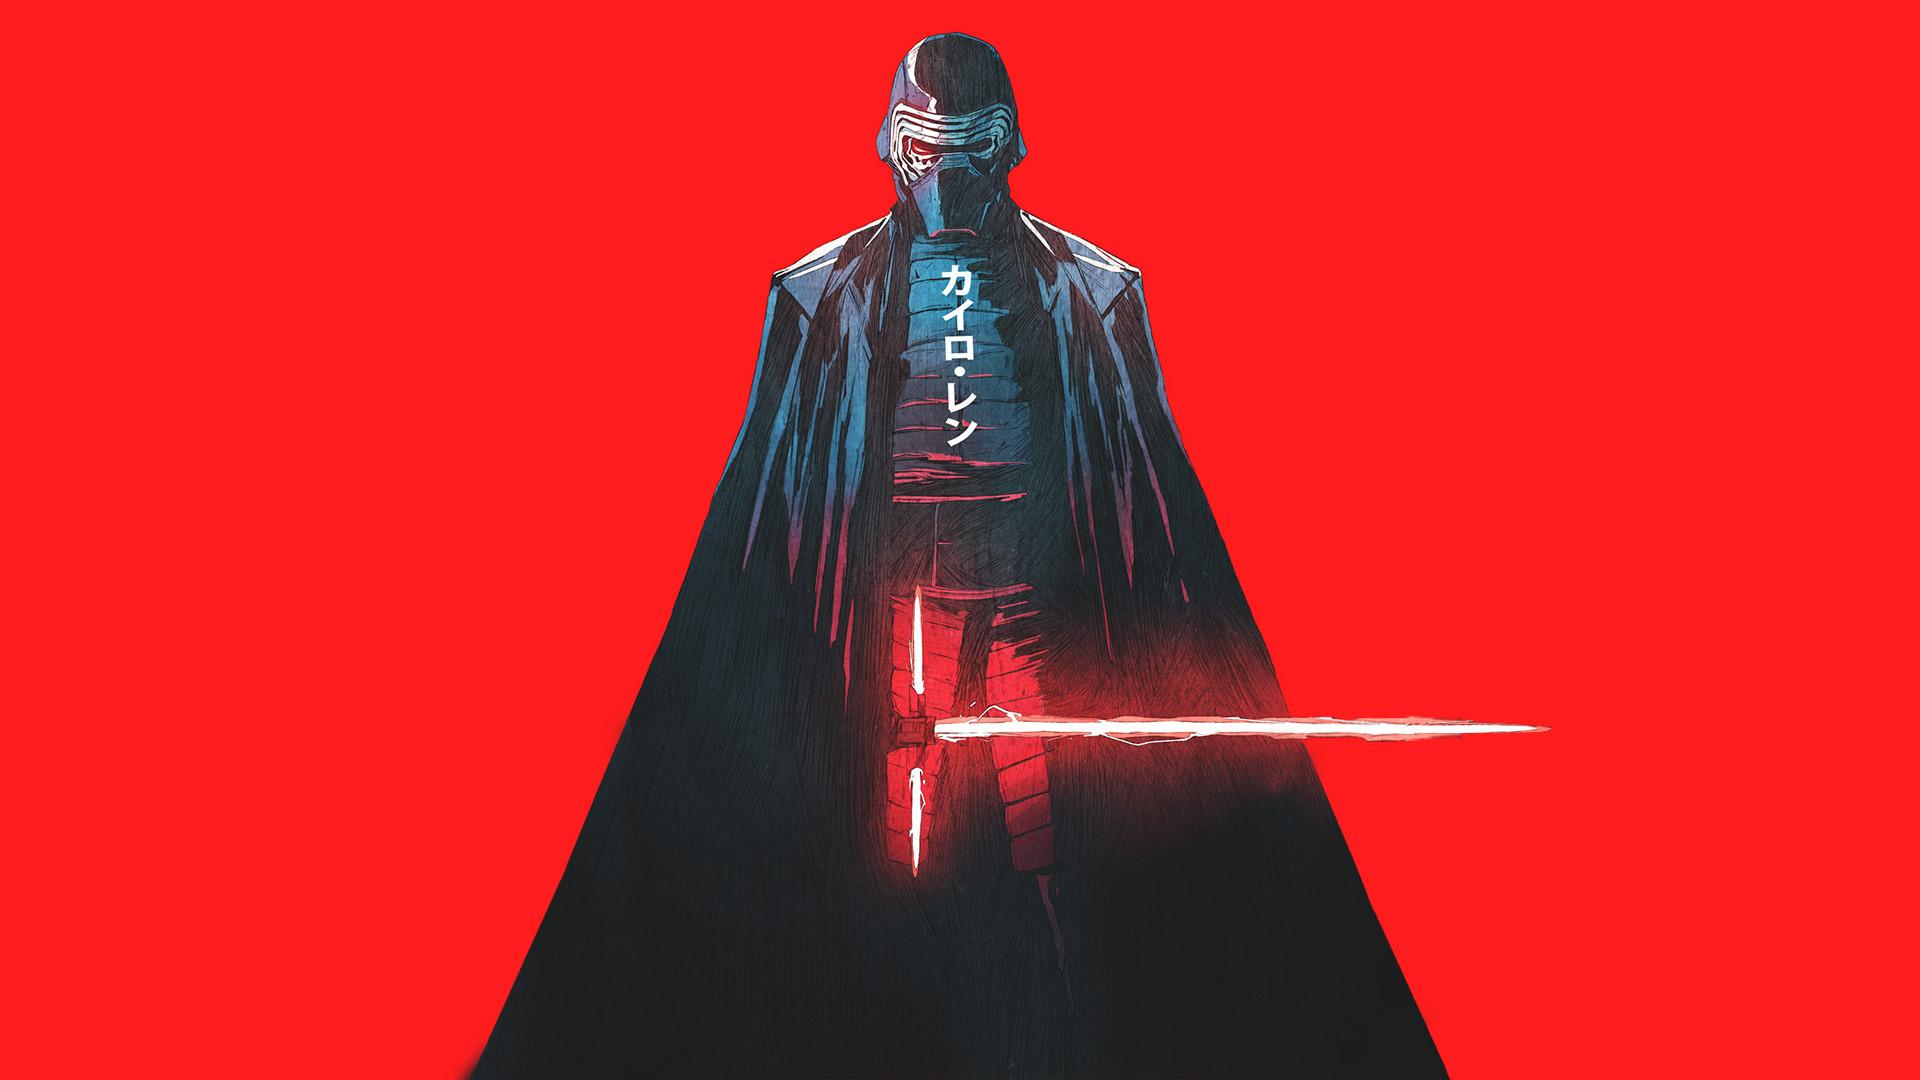 Star Wars Sword Warrior Red Neon Digital Art Red Background Kylo Ren Wallpaper Resolution 1920x1080 Id 506707 Wallha Com